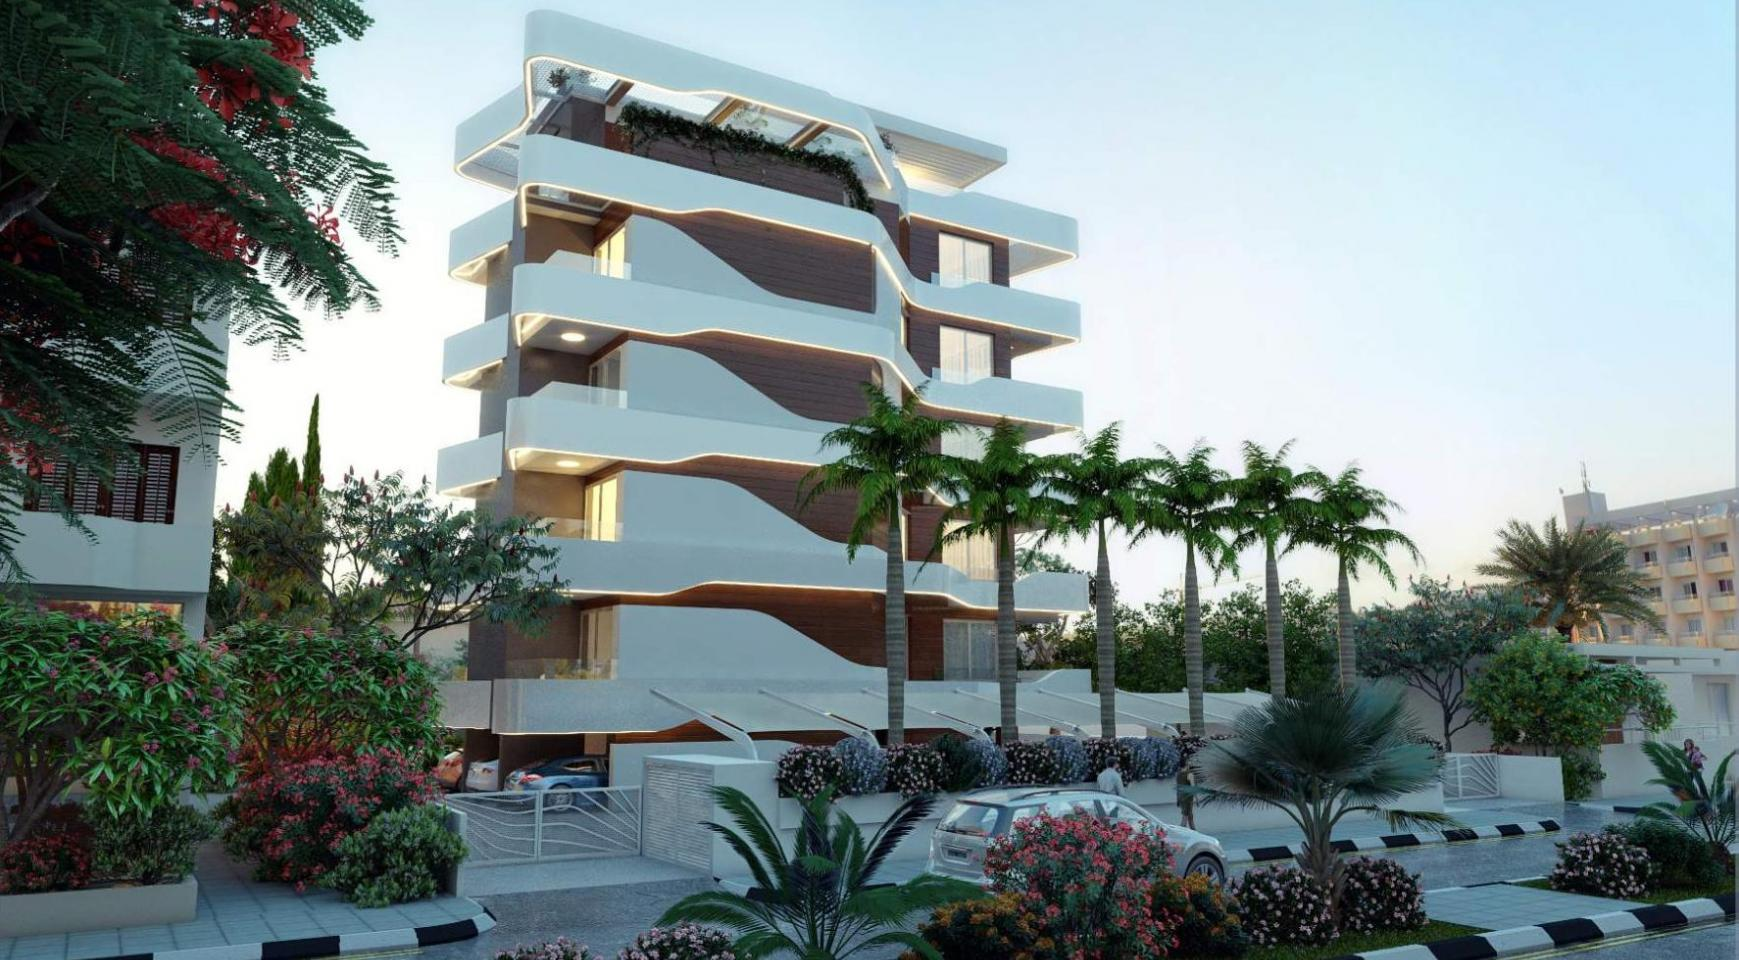 New 2 Bedroom Apartment in a Contemporary Complex near the Sea - 2